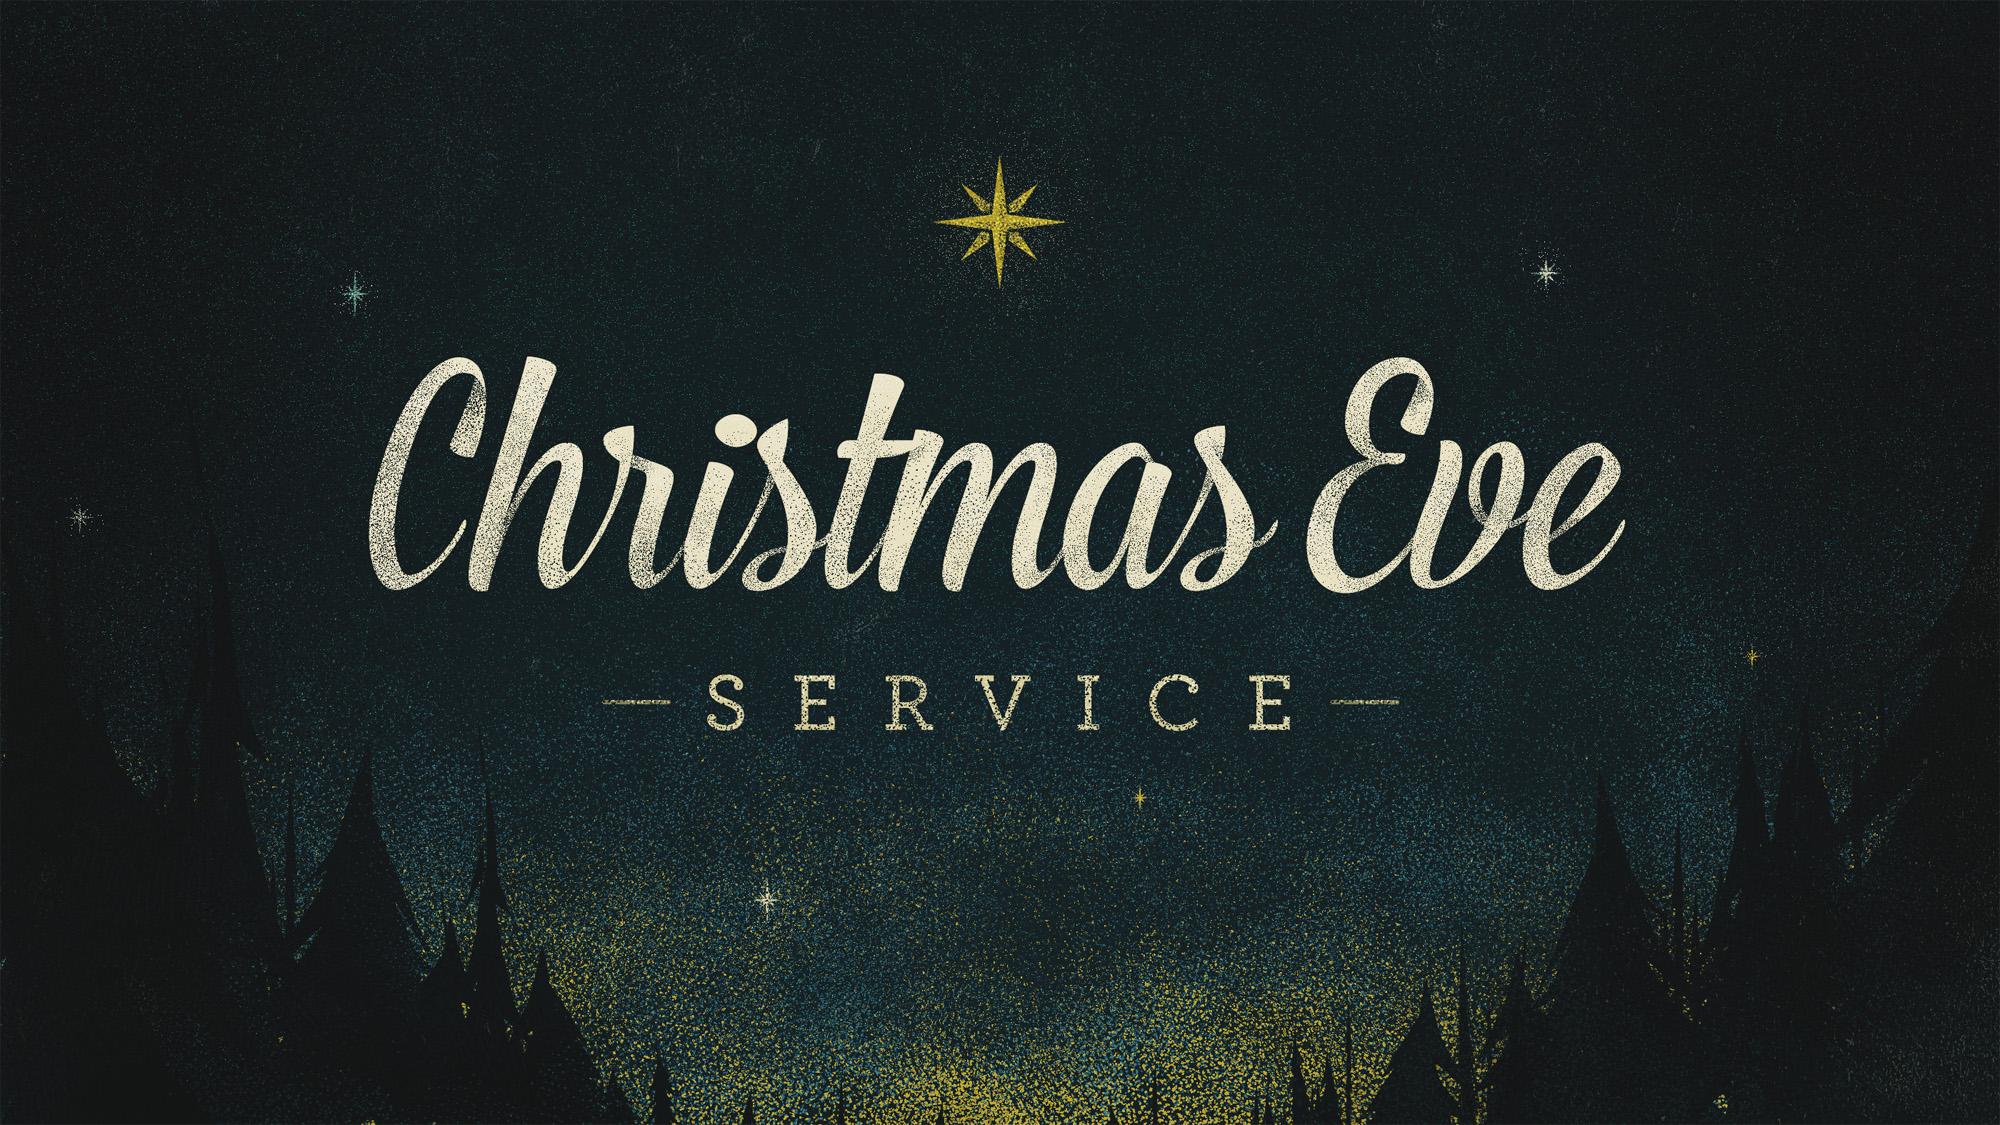 Christmas Eve Service 2019 Near Me Christmas Eve Service | Woodside SDA Church